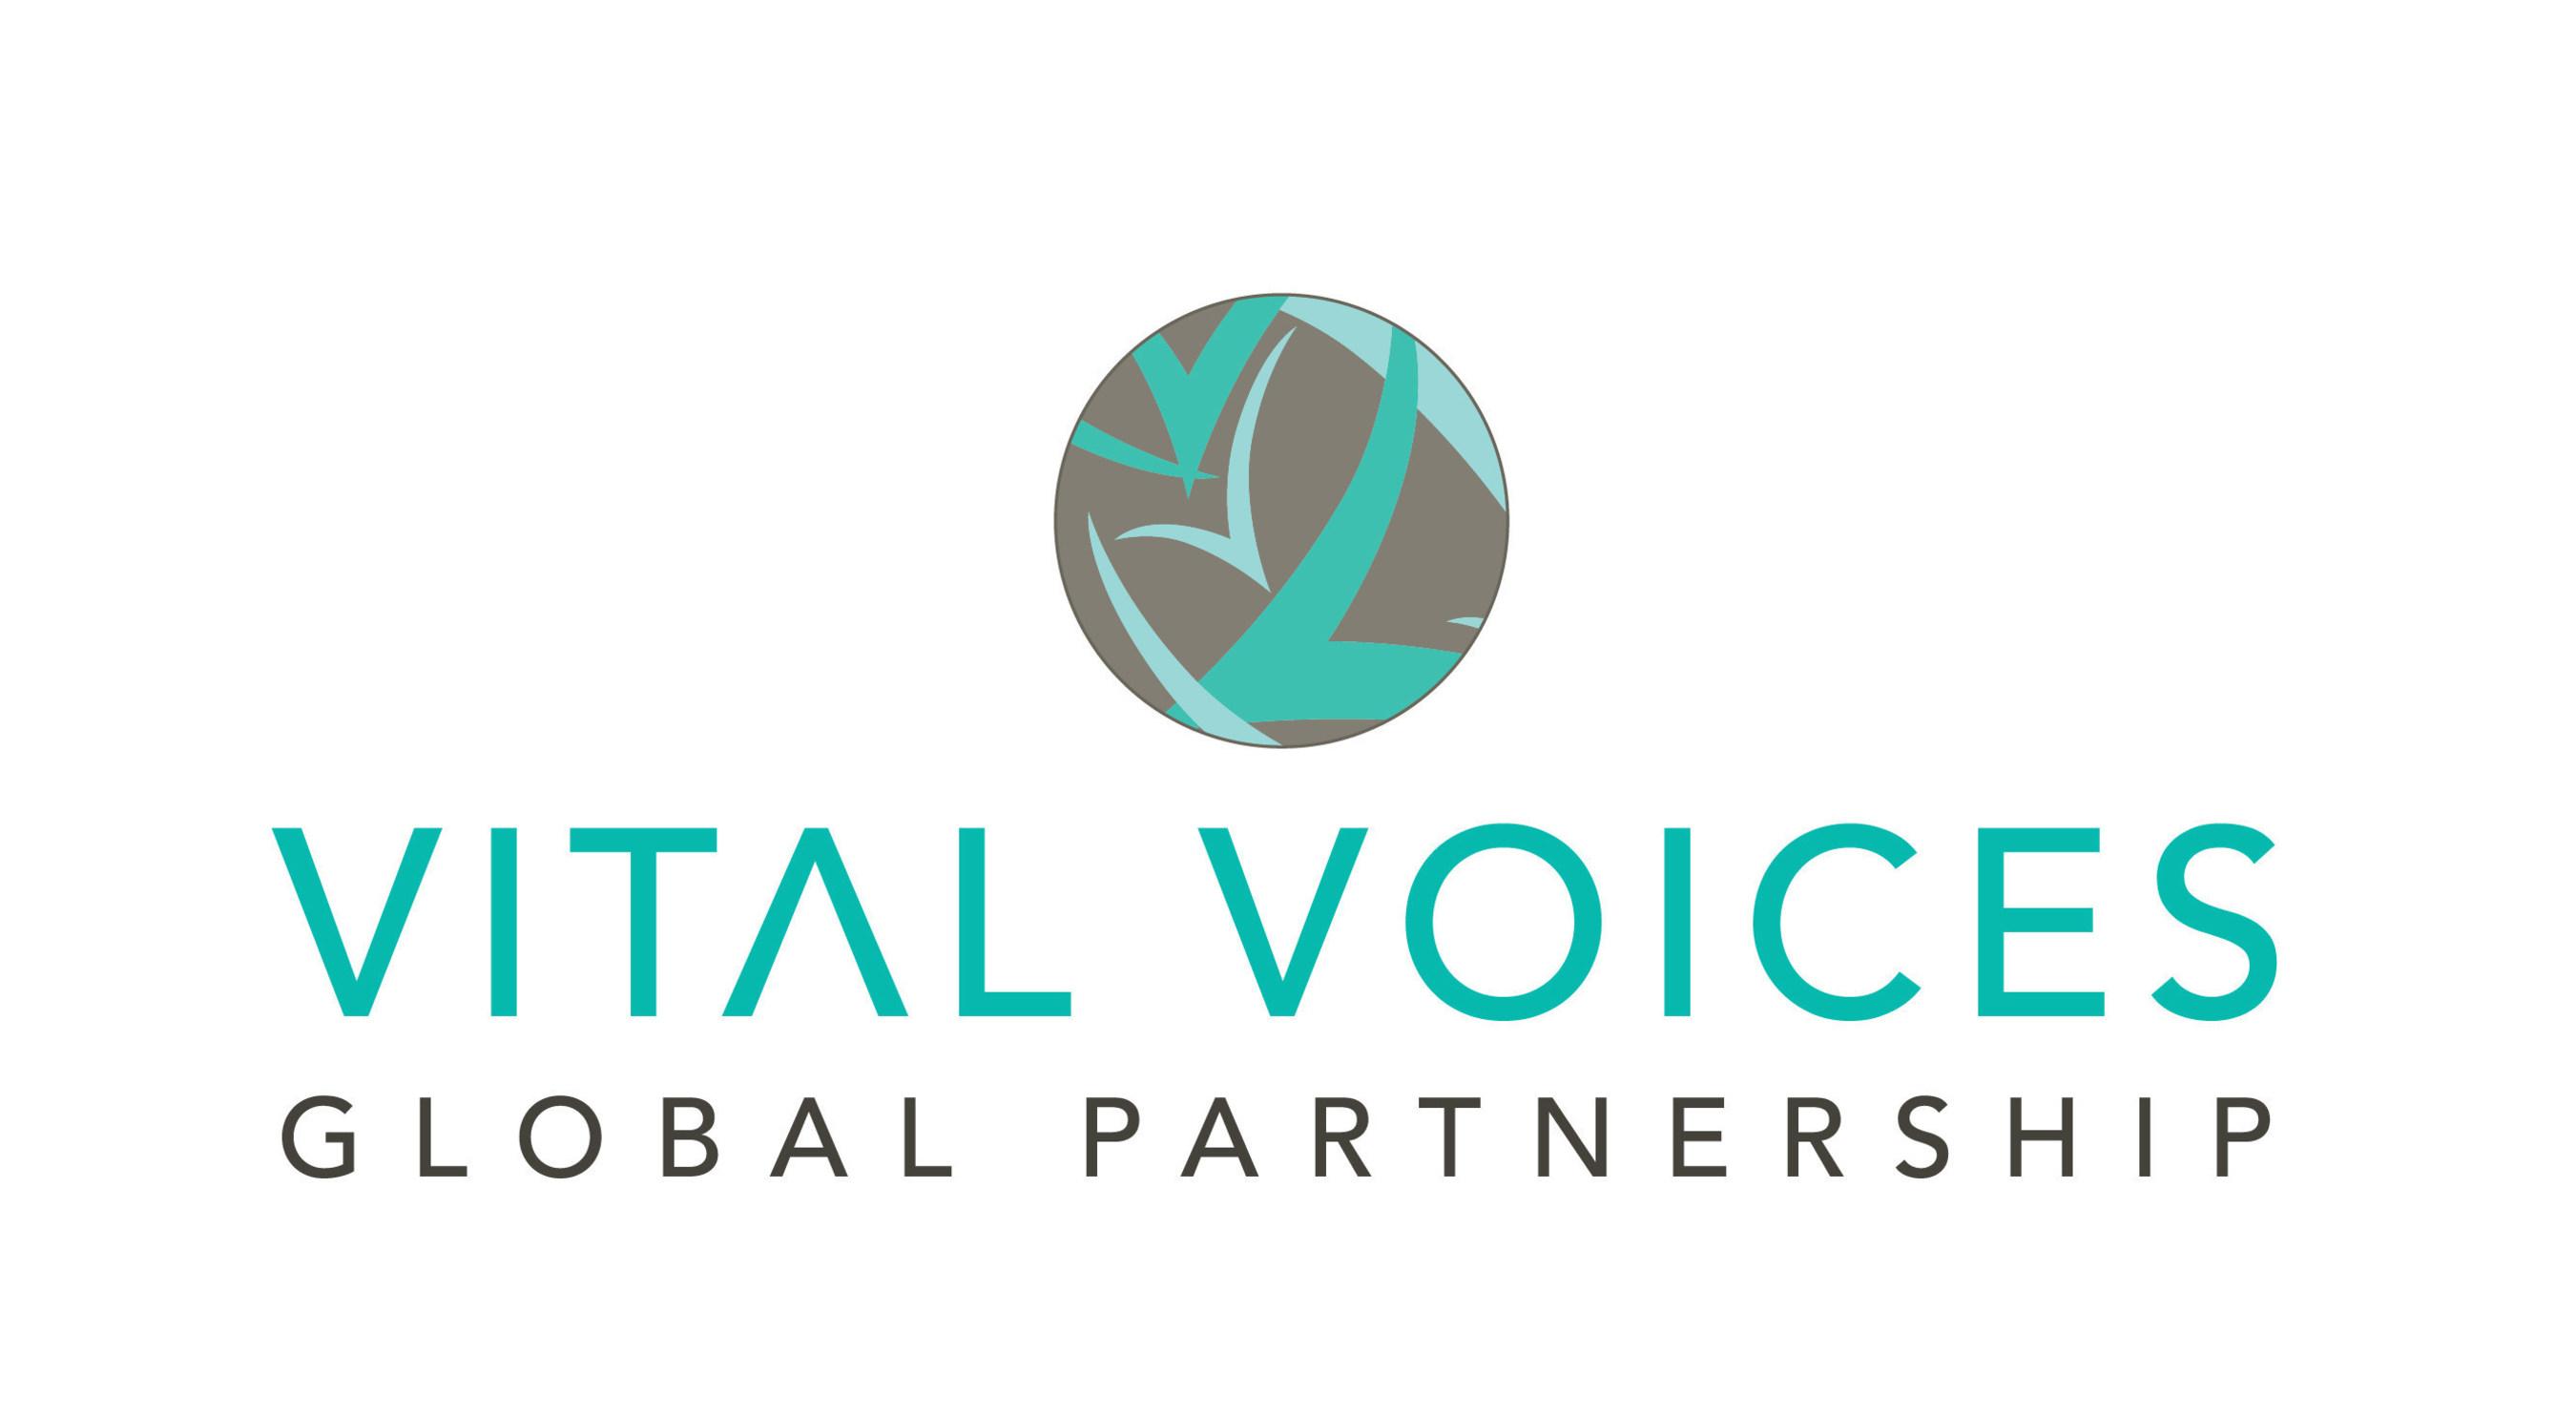 Vital Voices Global Partnership